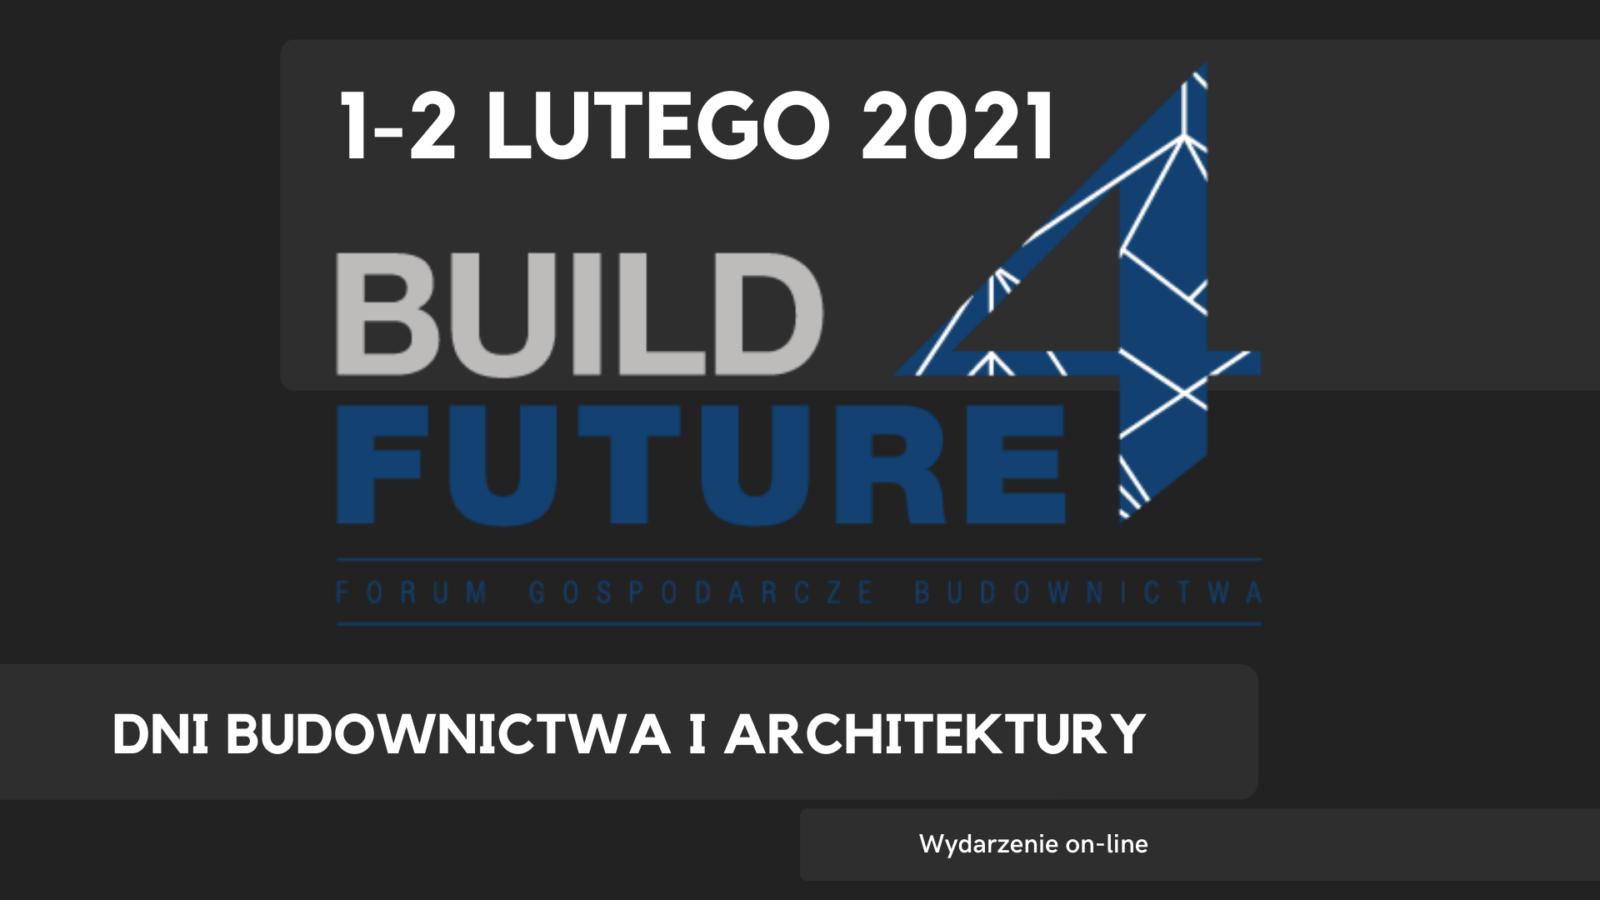 Dni Budownictwa i Architektury – Forum Gospodarcze Budownictwa BUILD 4 FUTURE